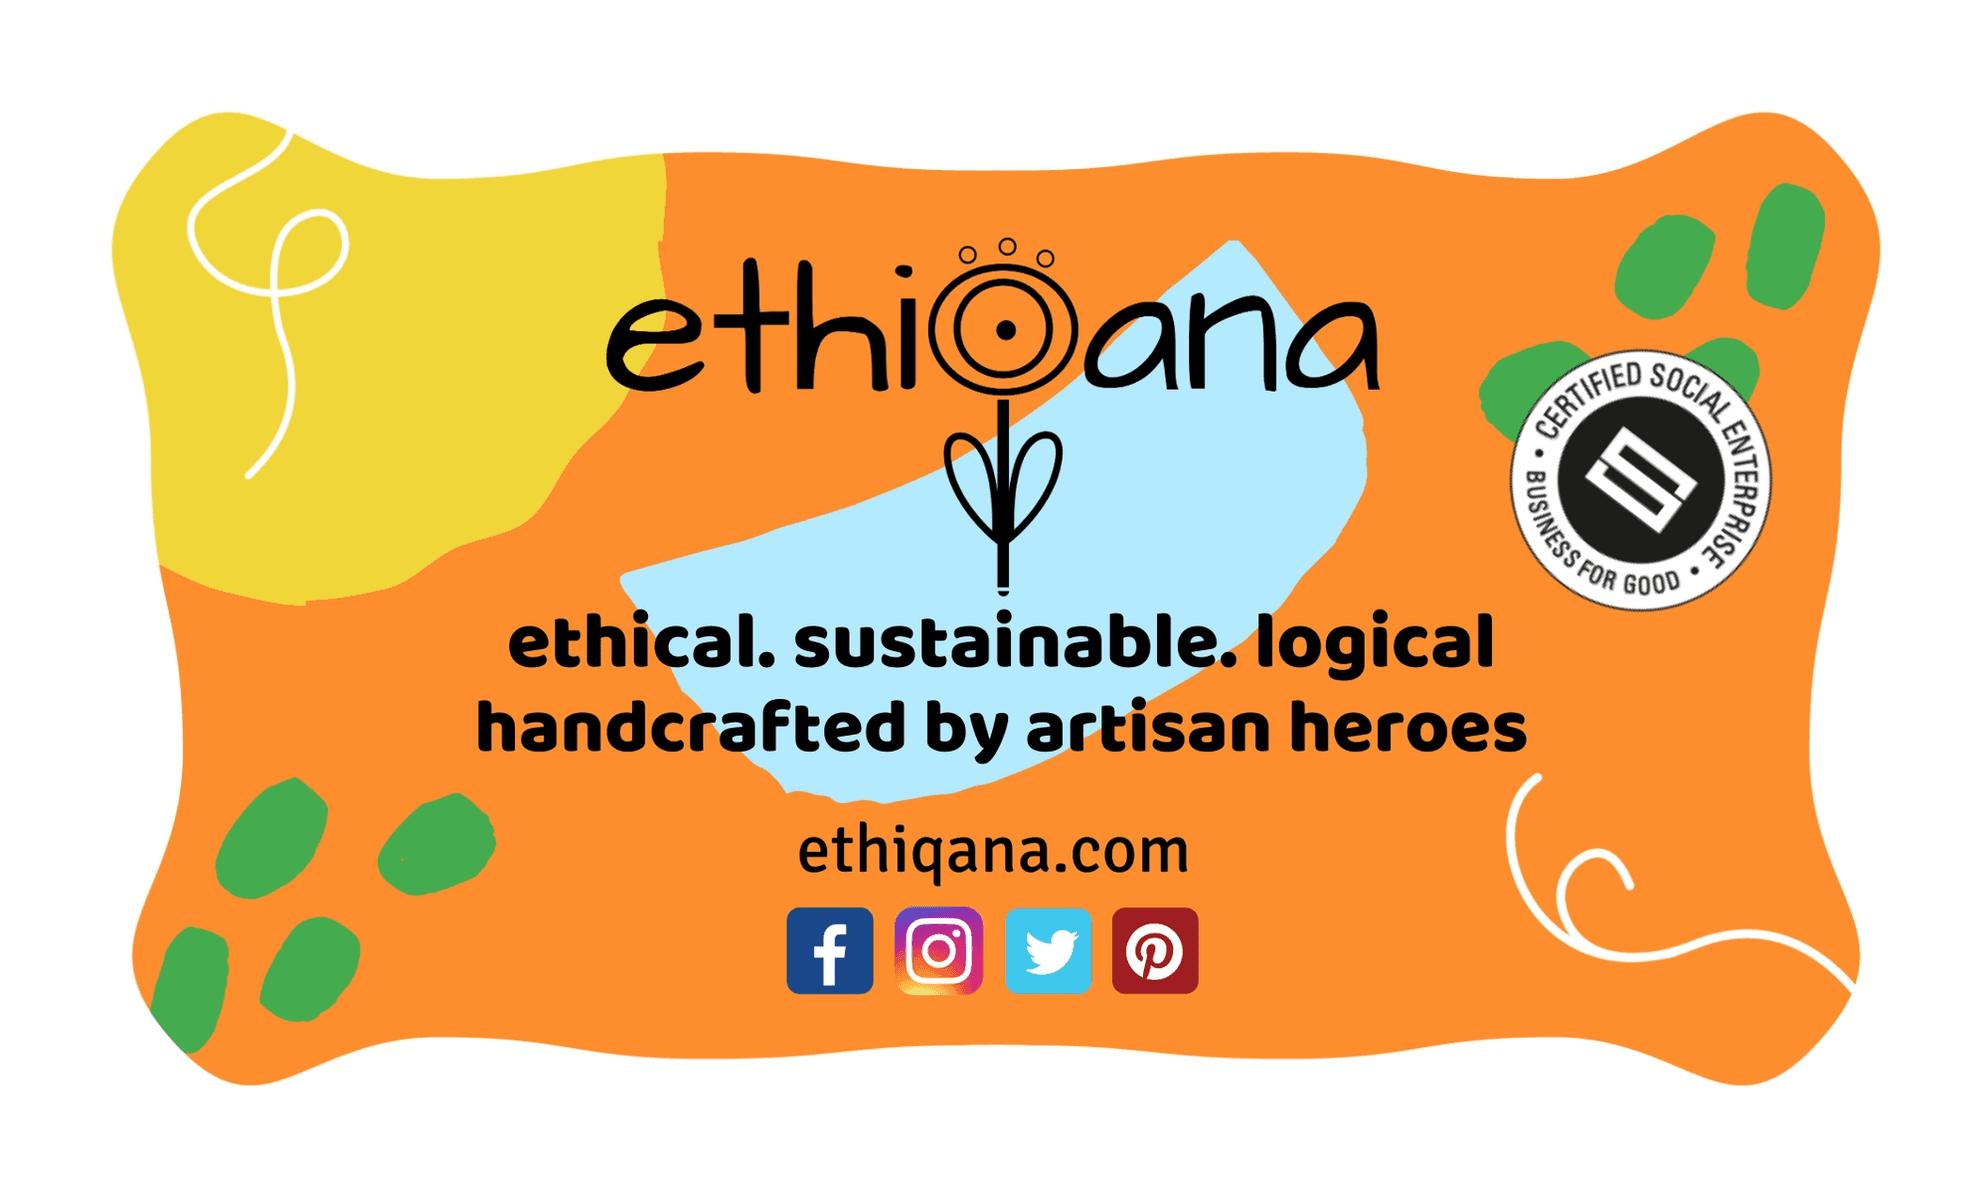 Ethiqana